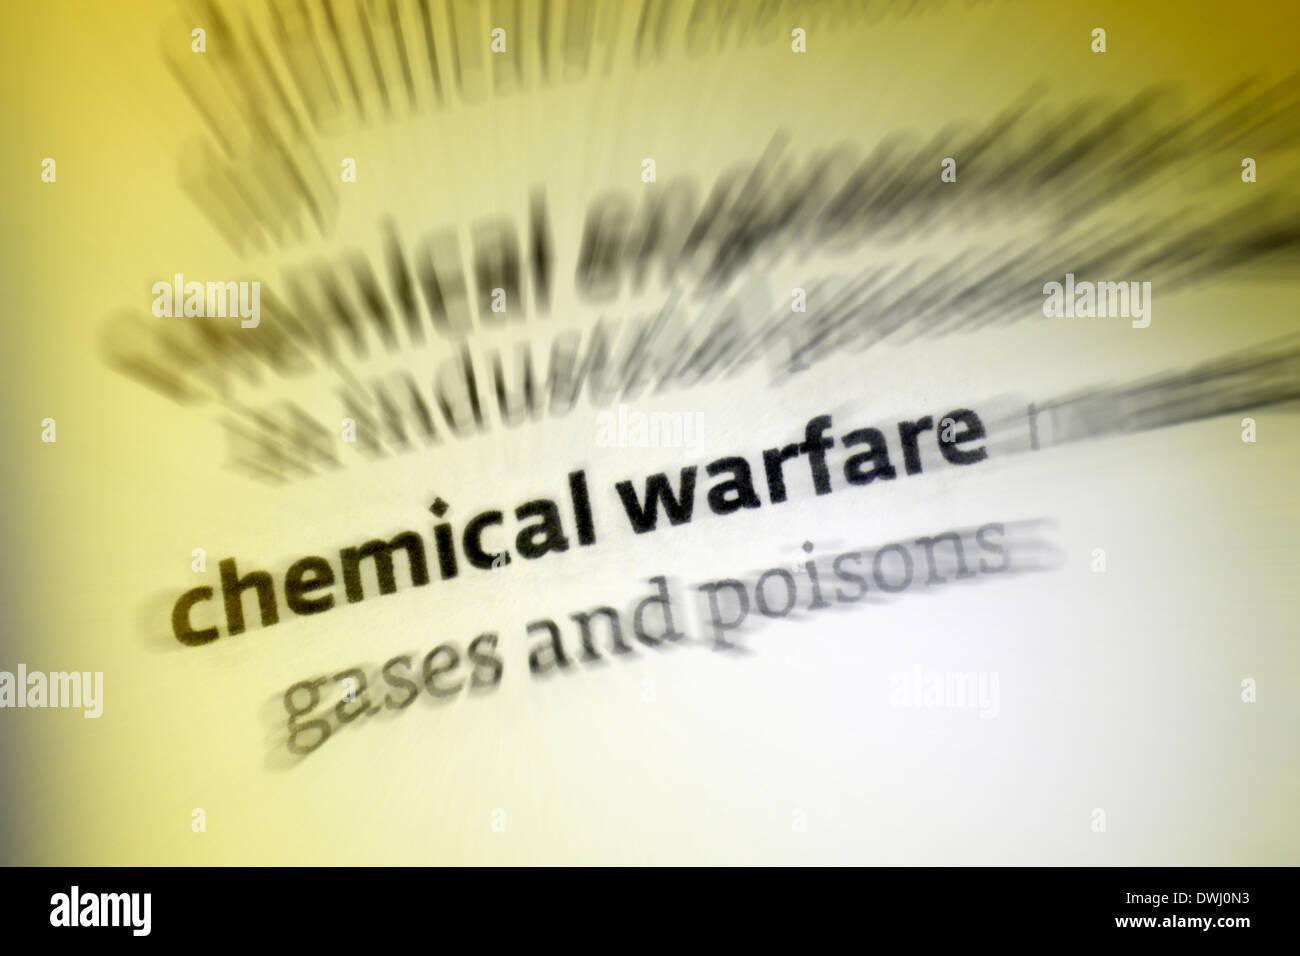 Chemical warfare - Stock Image